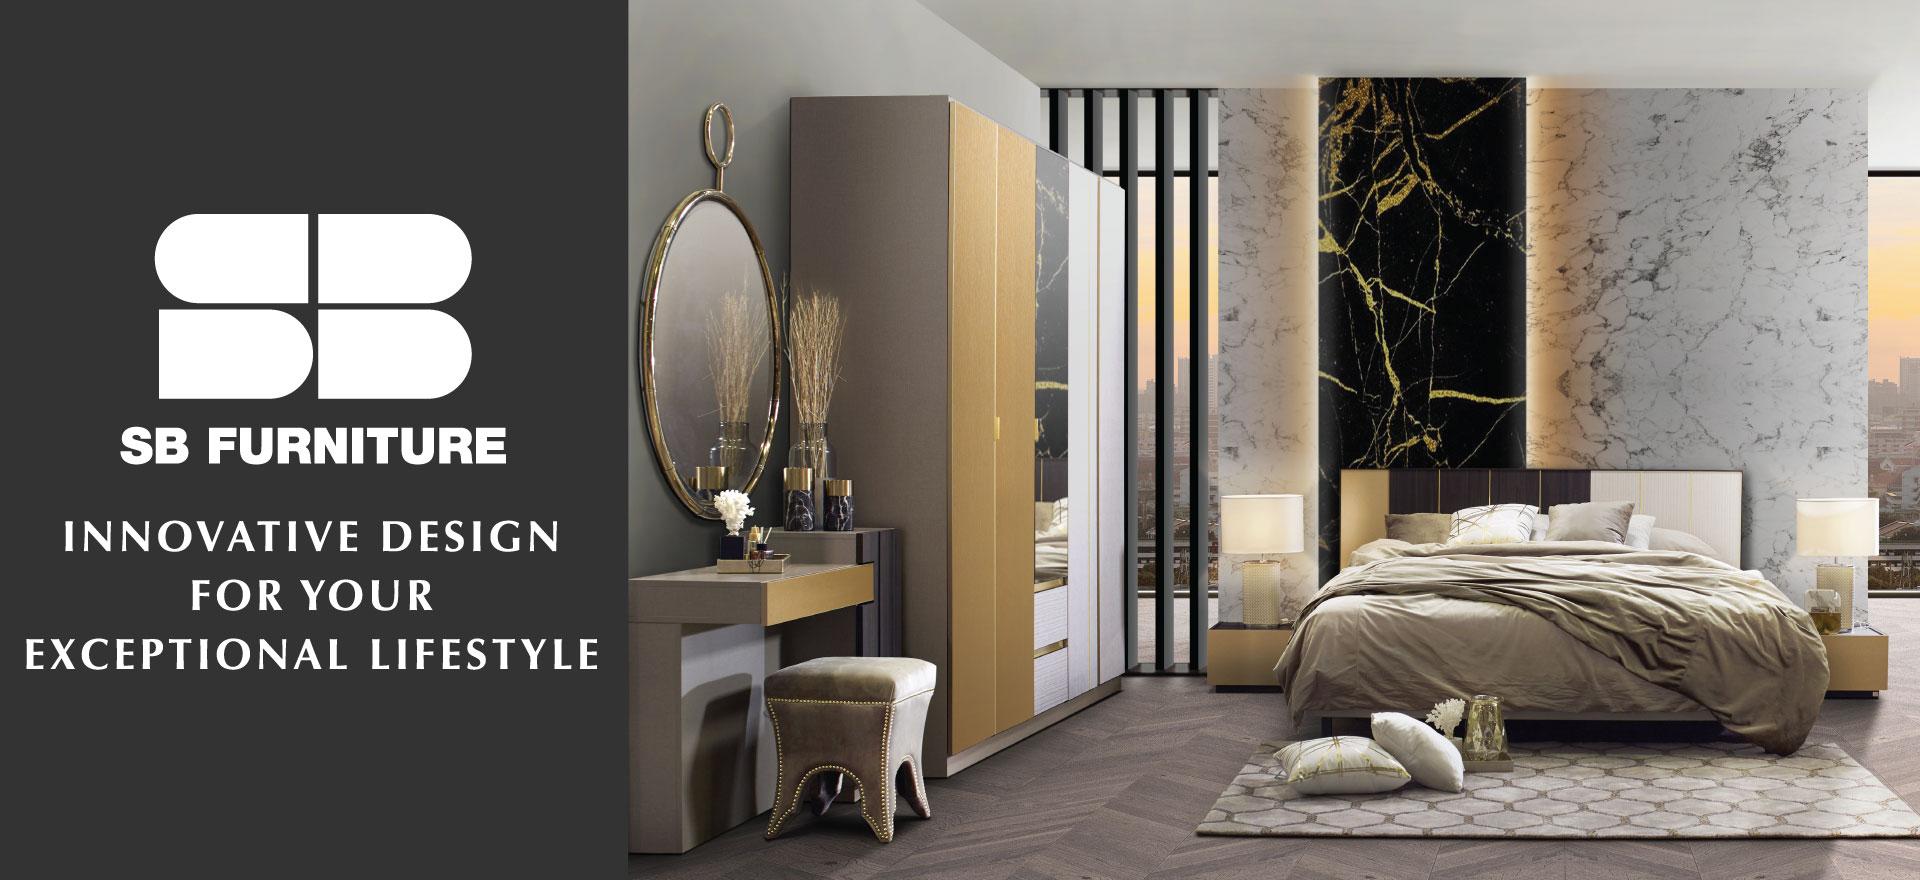 SB Furniture Catalog 2019